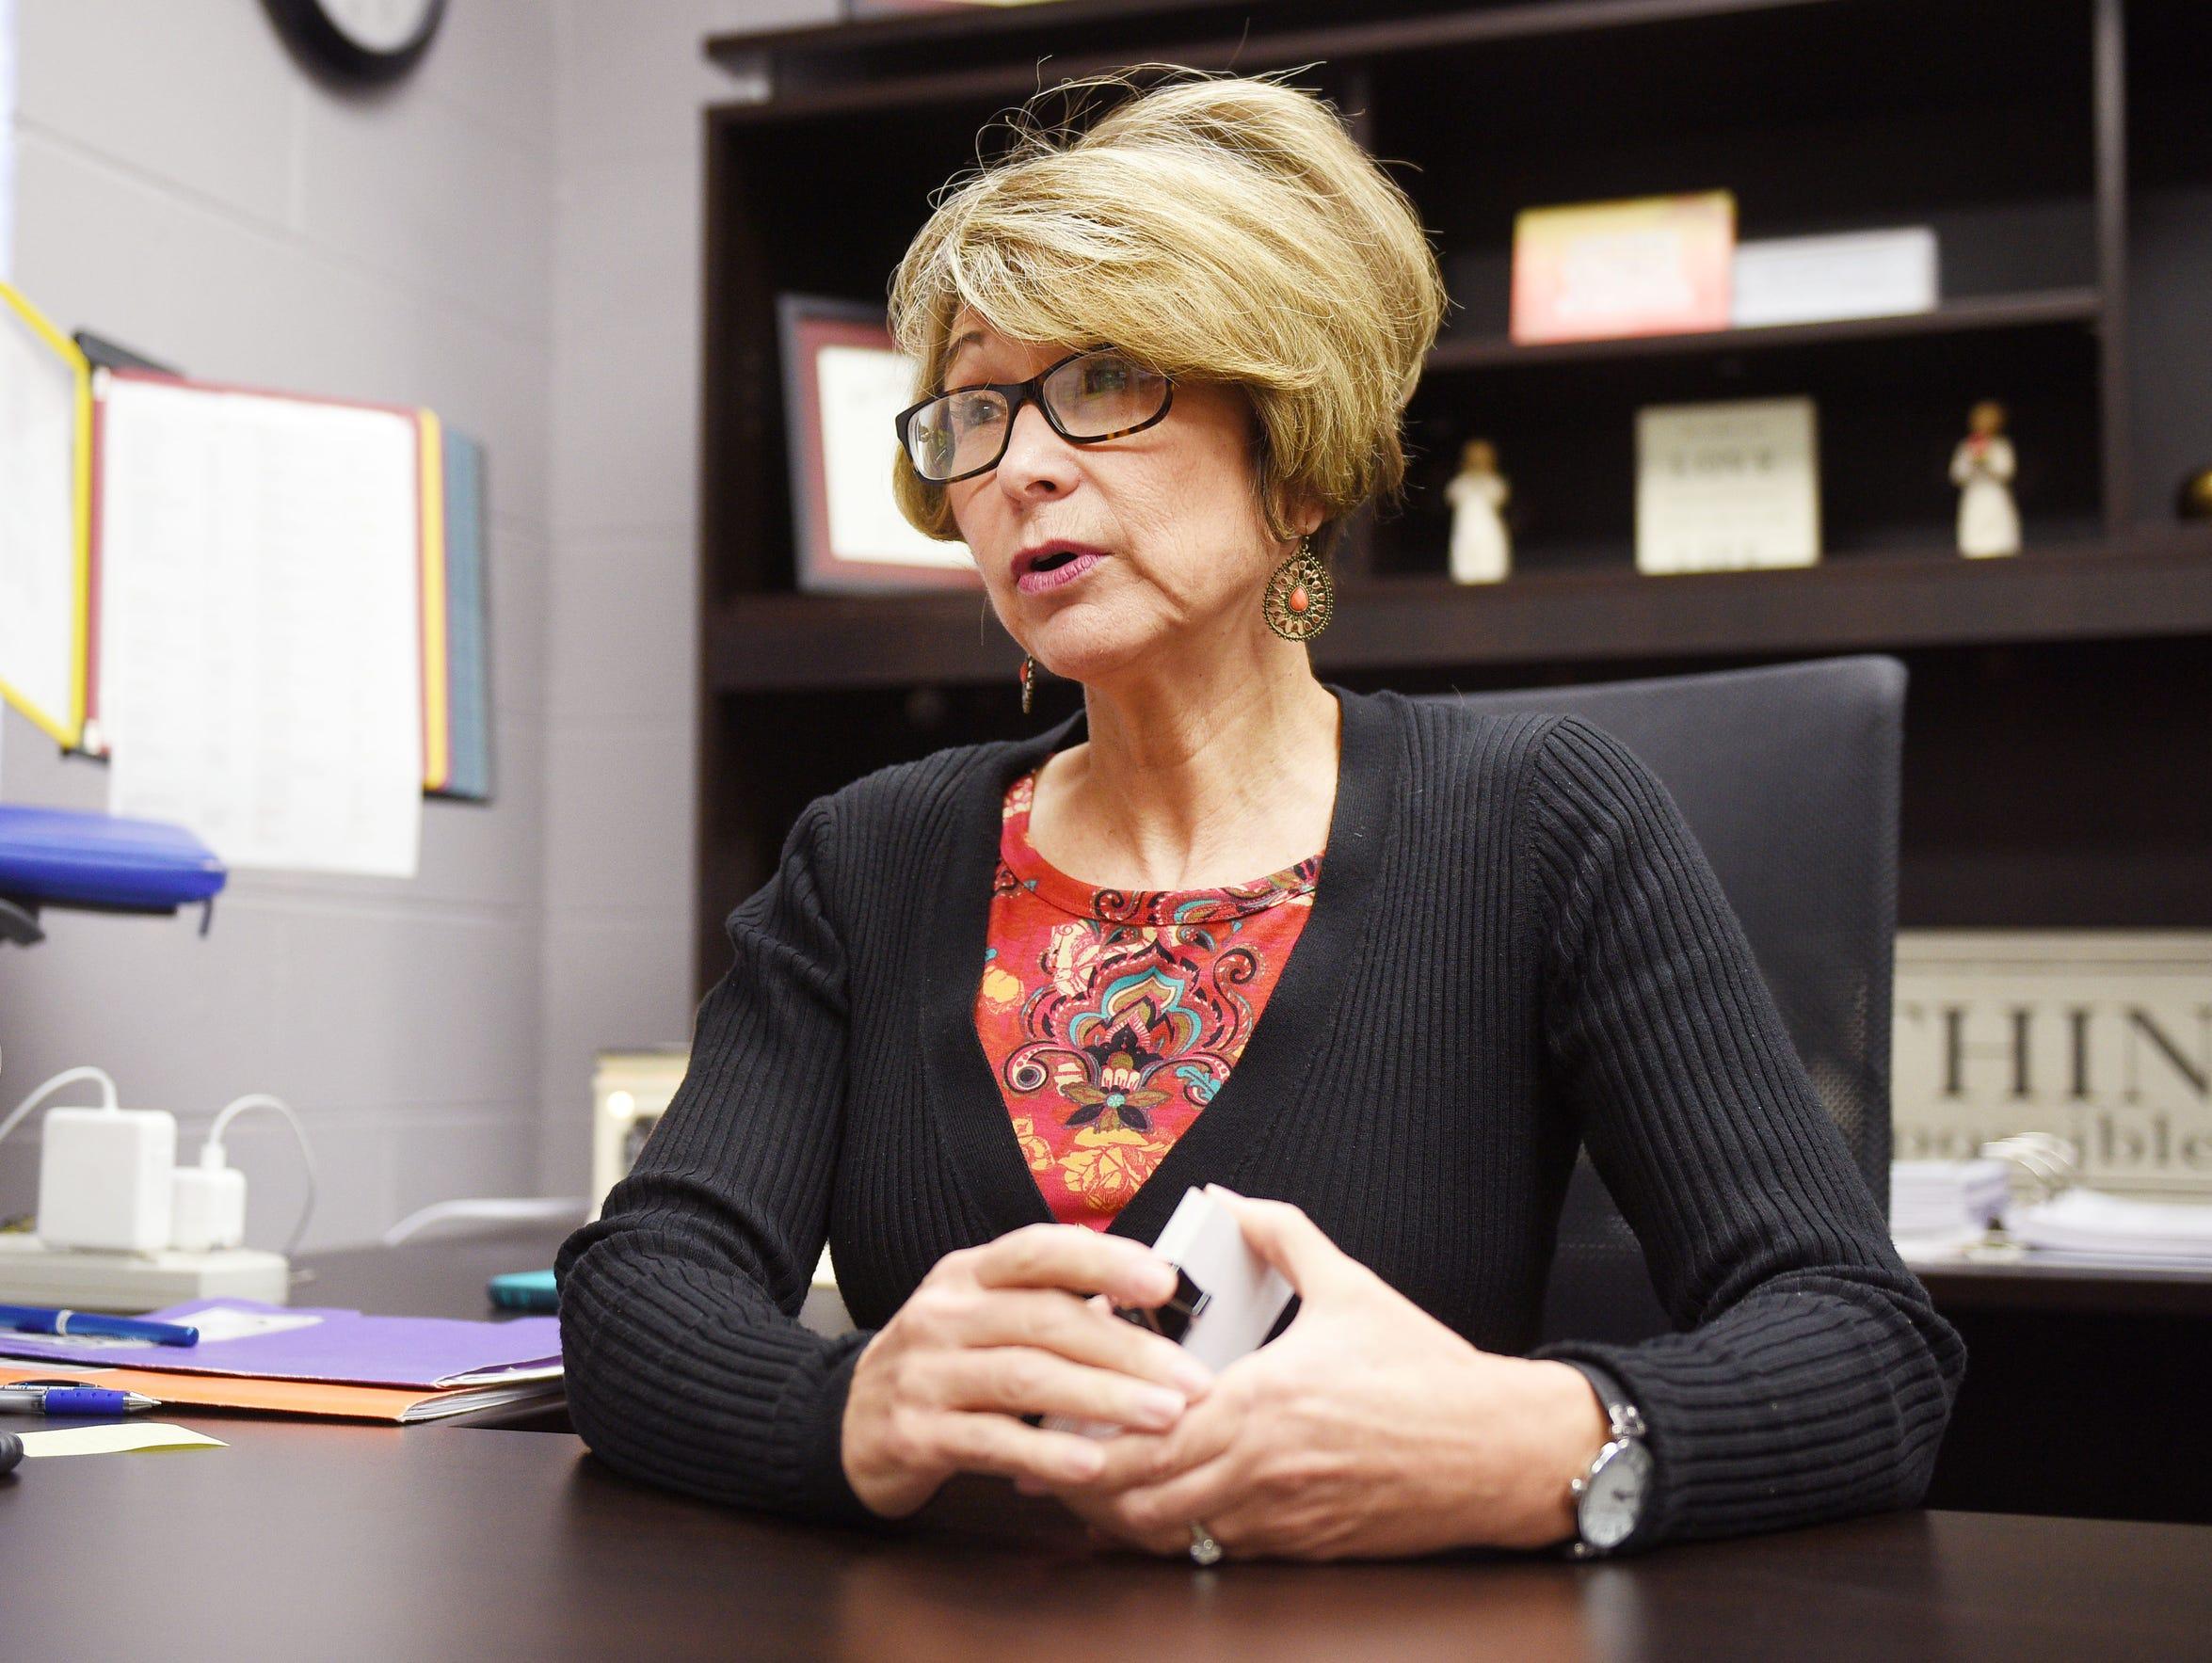 Todd County schools superintendent Karen Whitney talks